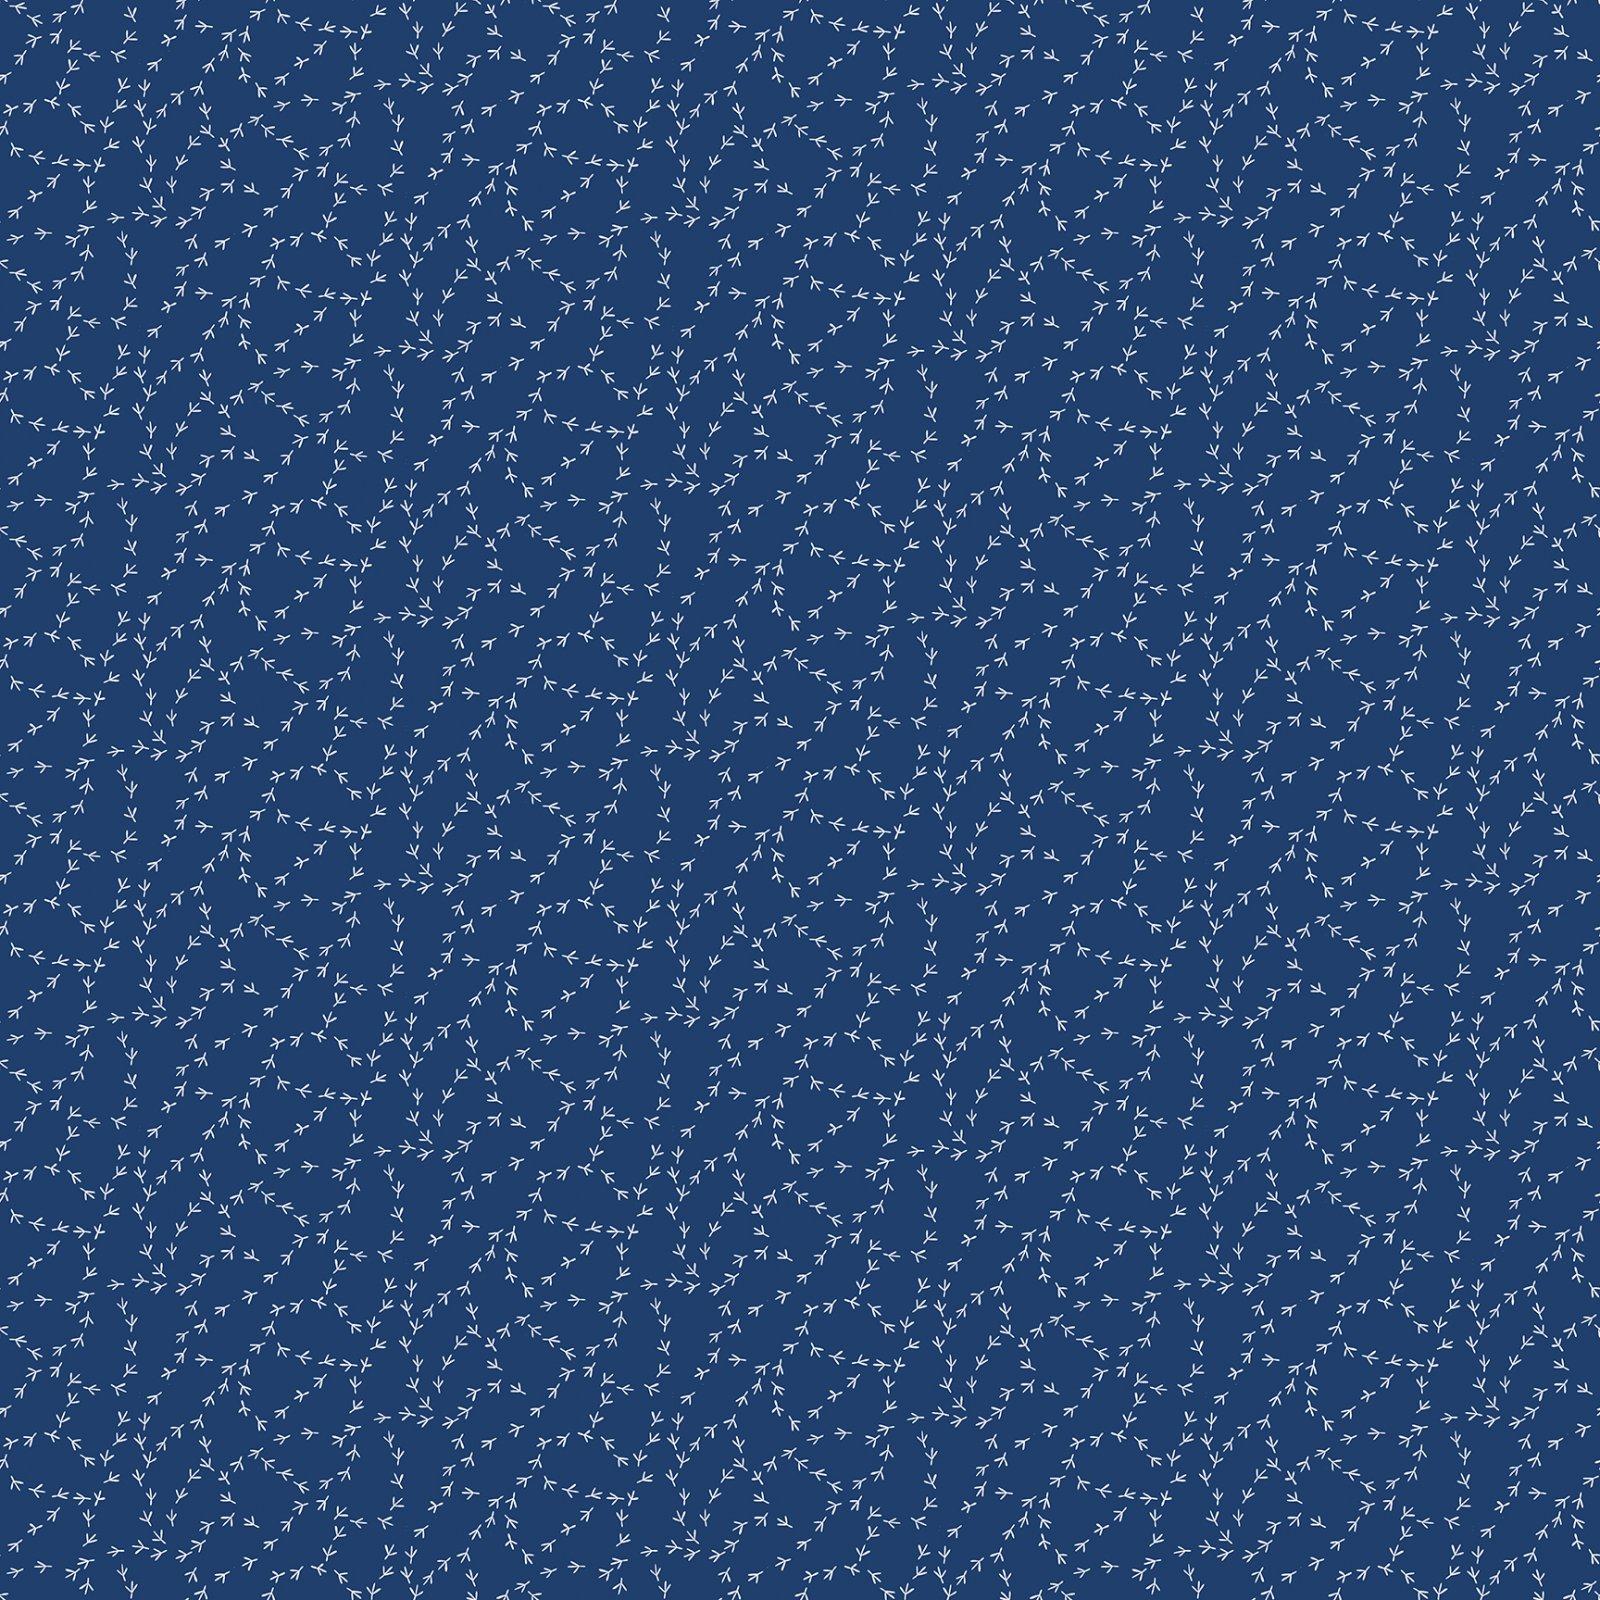 Navy blue tracks